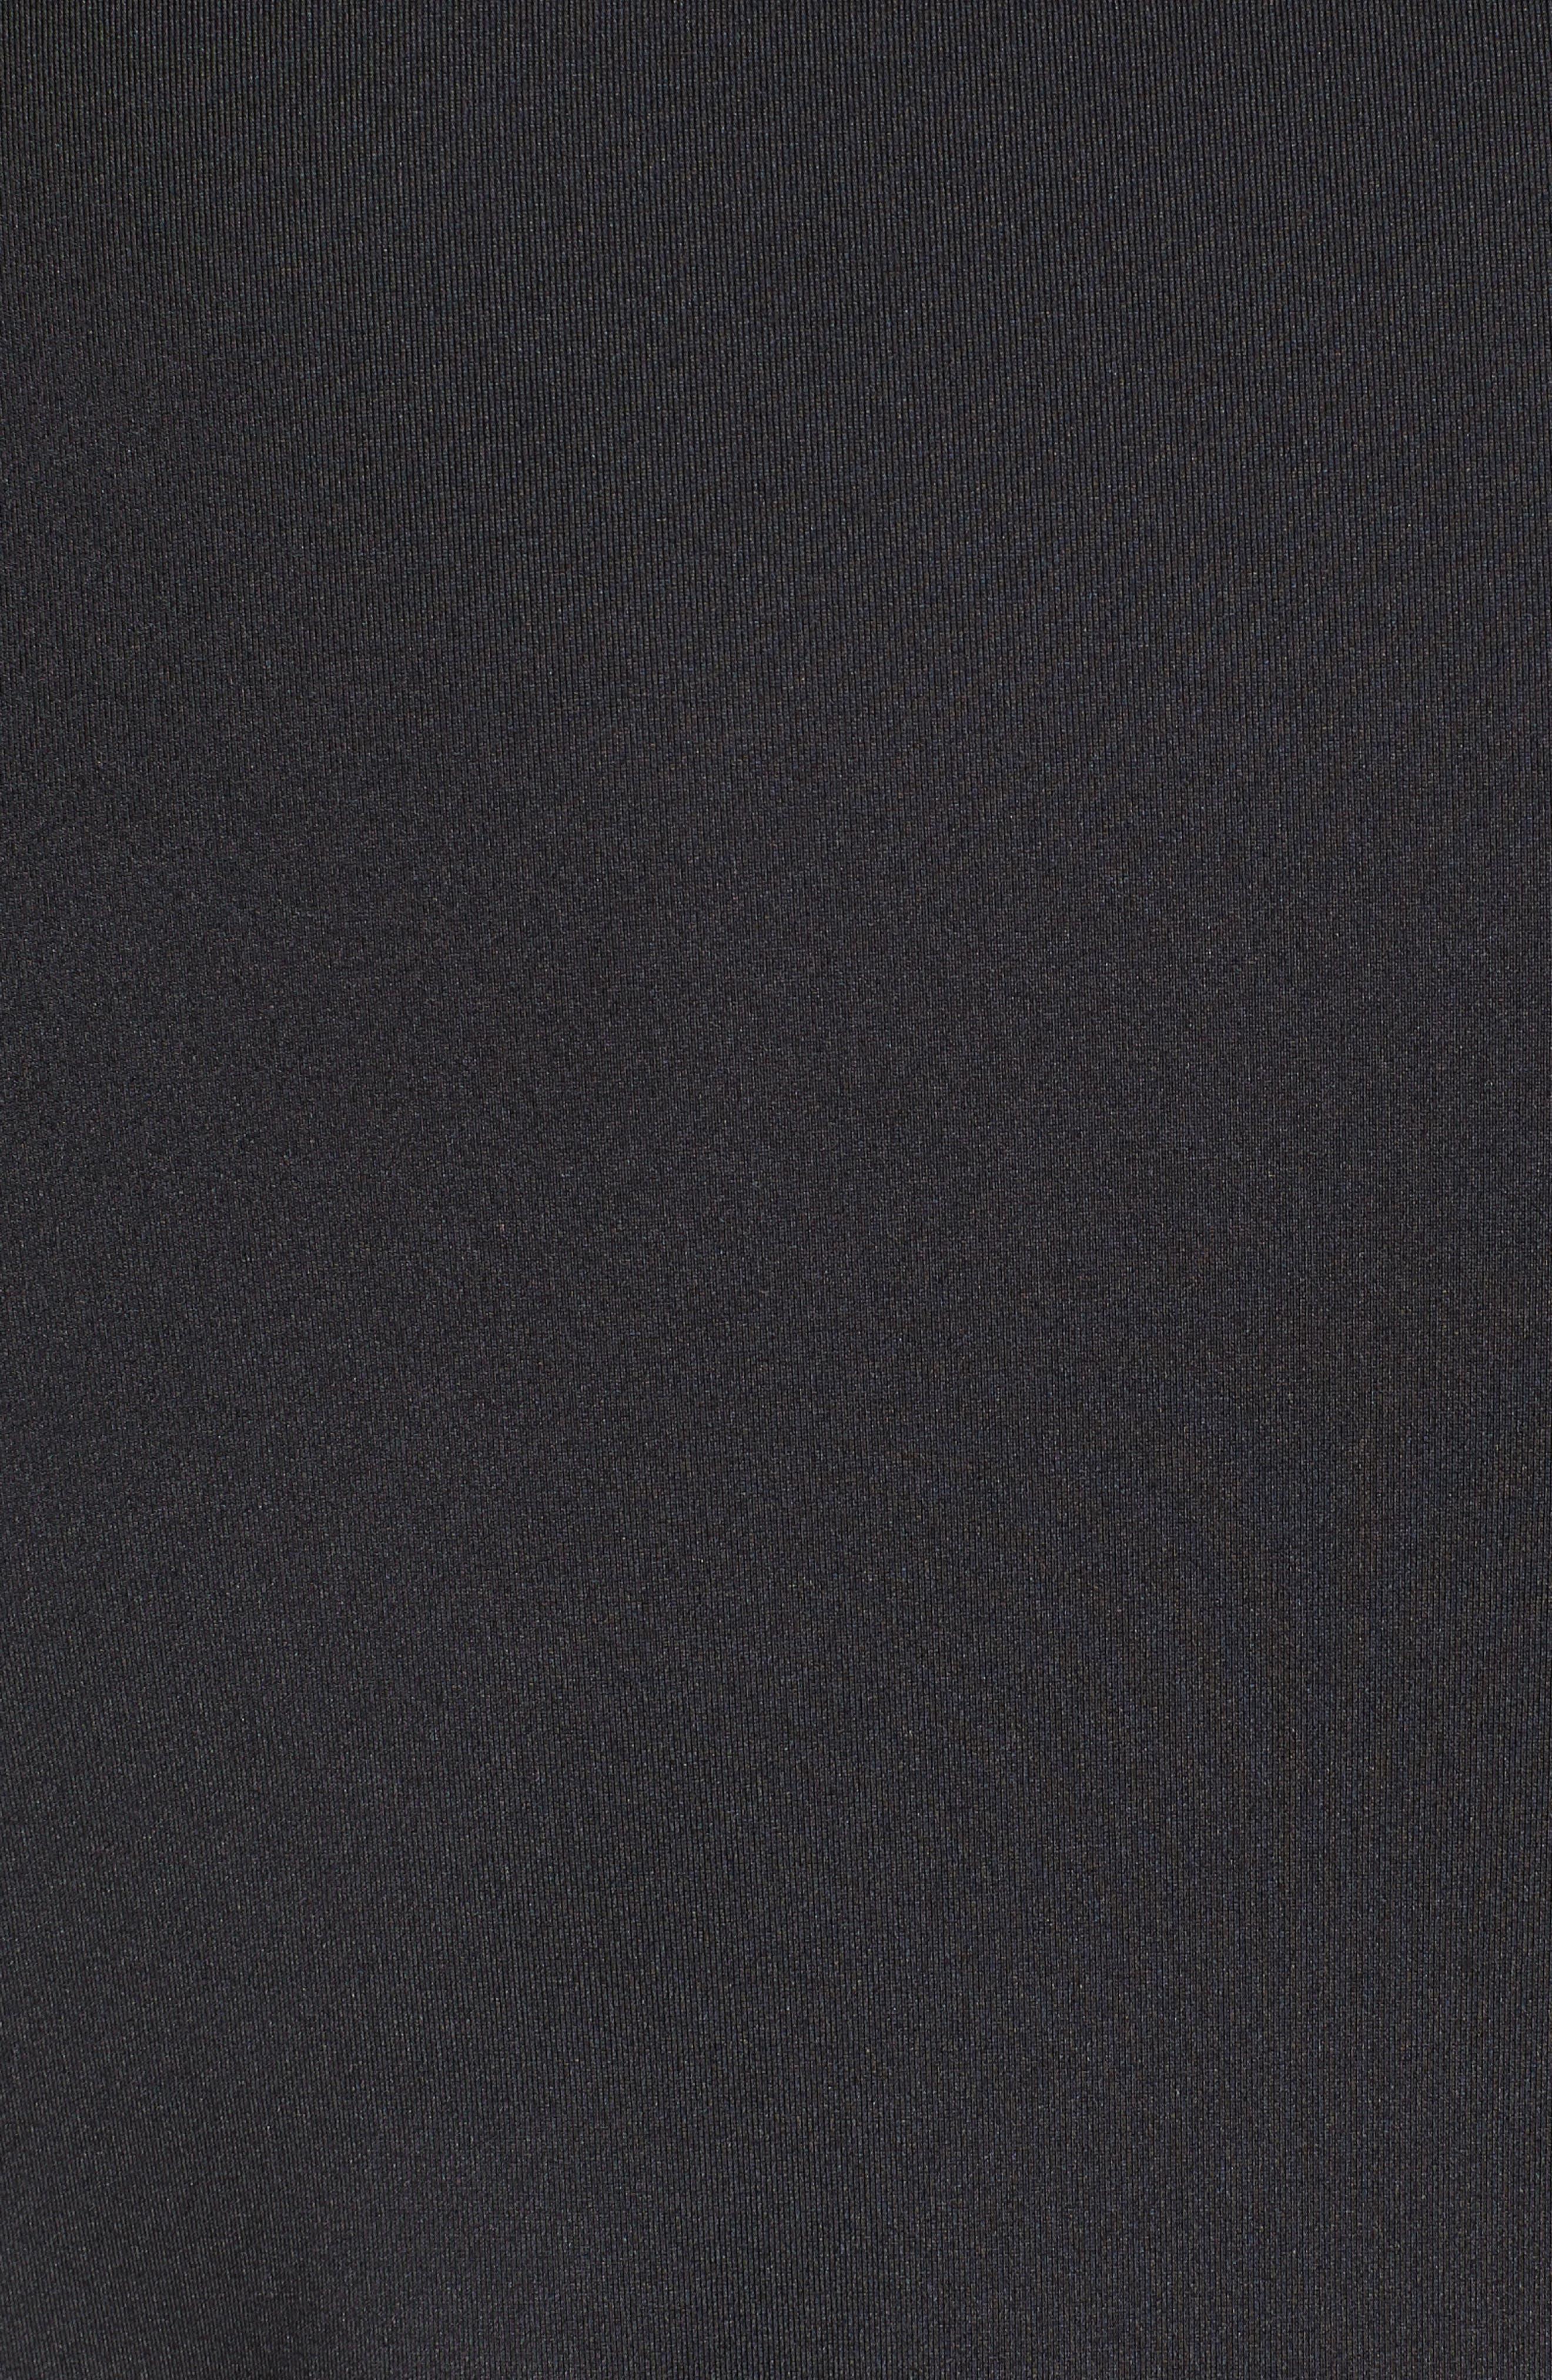 Regular Fit Novak Djokovic Ultra Dry Polo,                             Alternate thumbnail 5, color,                             003